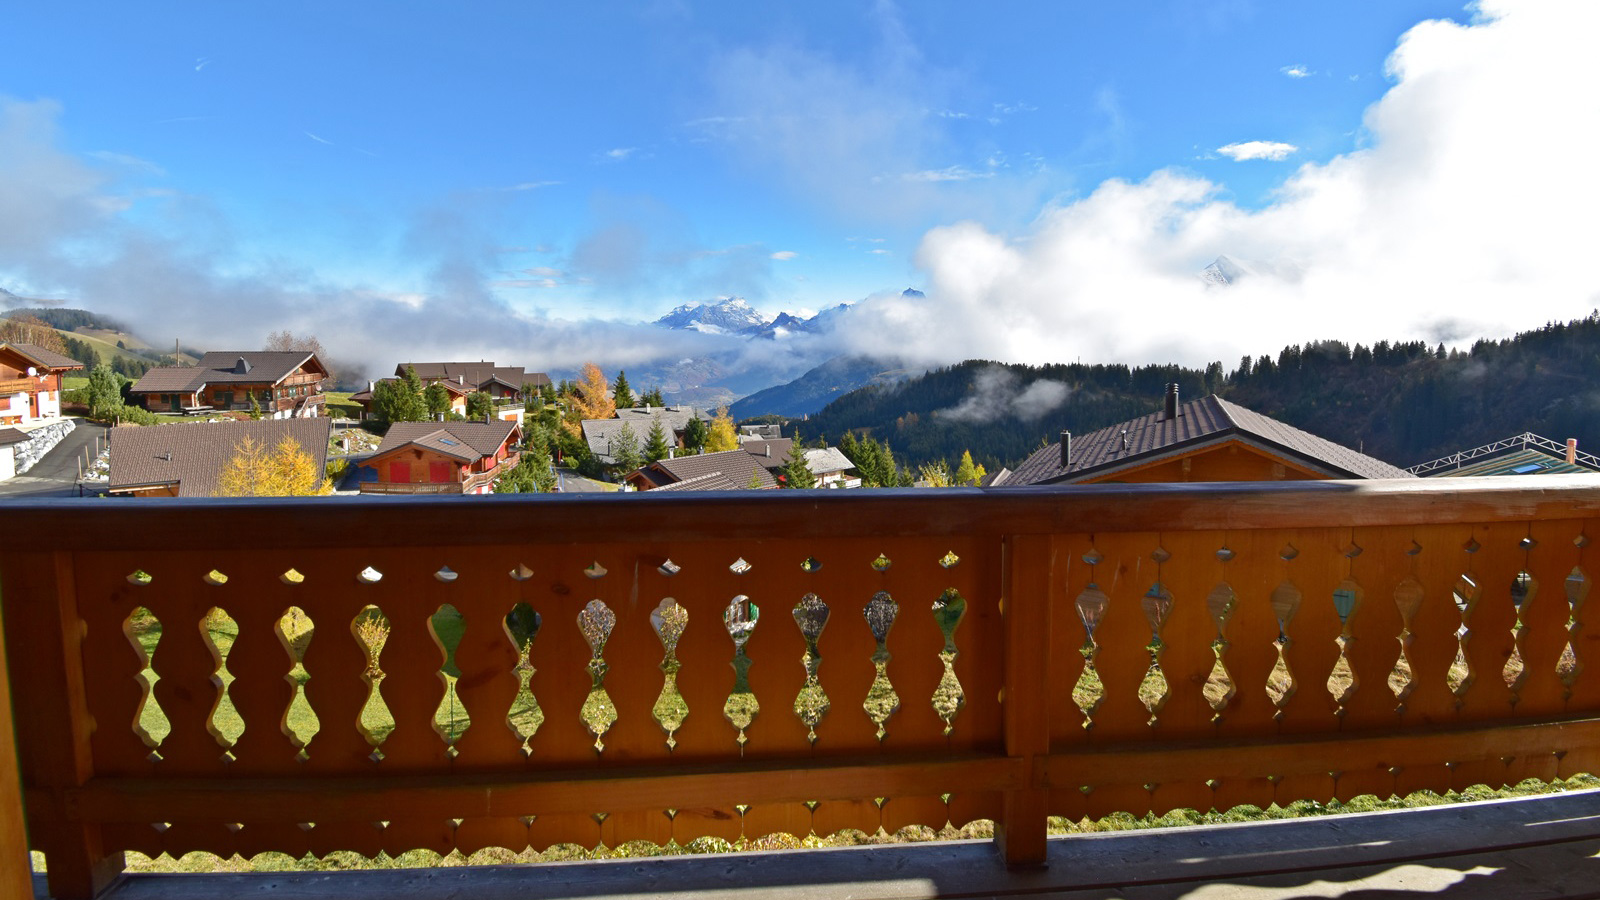 Chalet Fayot Chalet, Switzerland